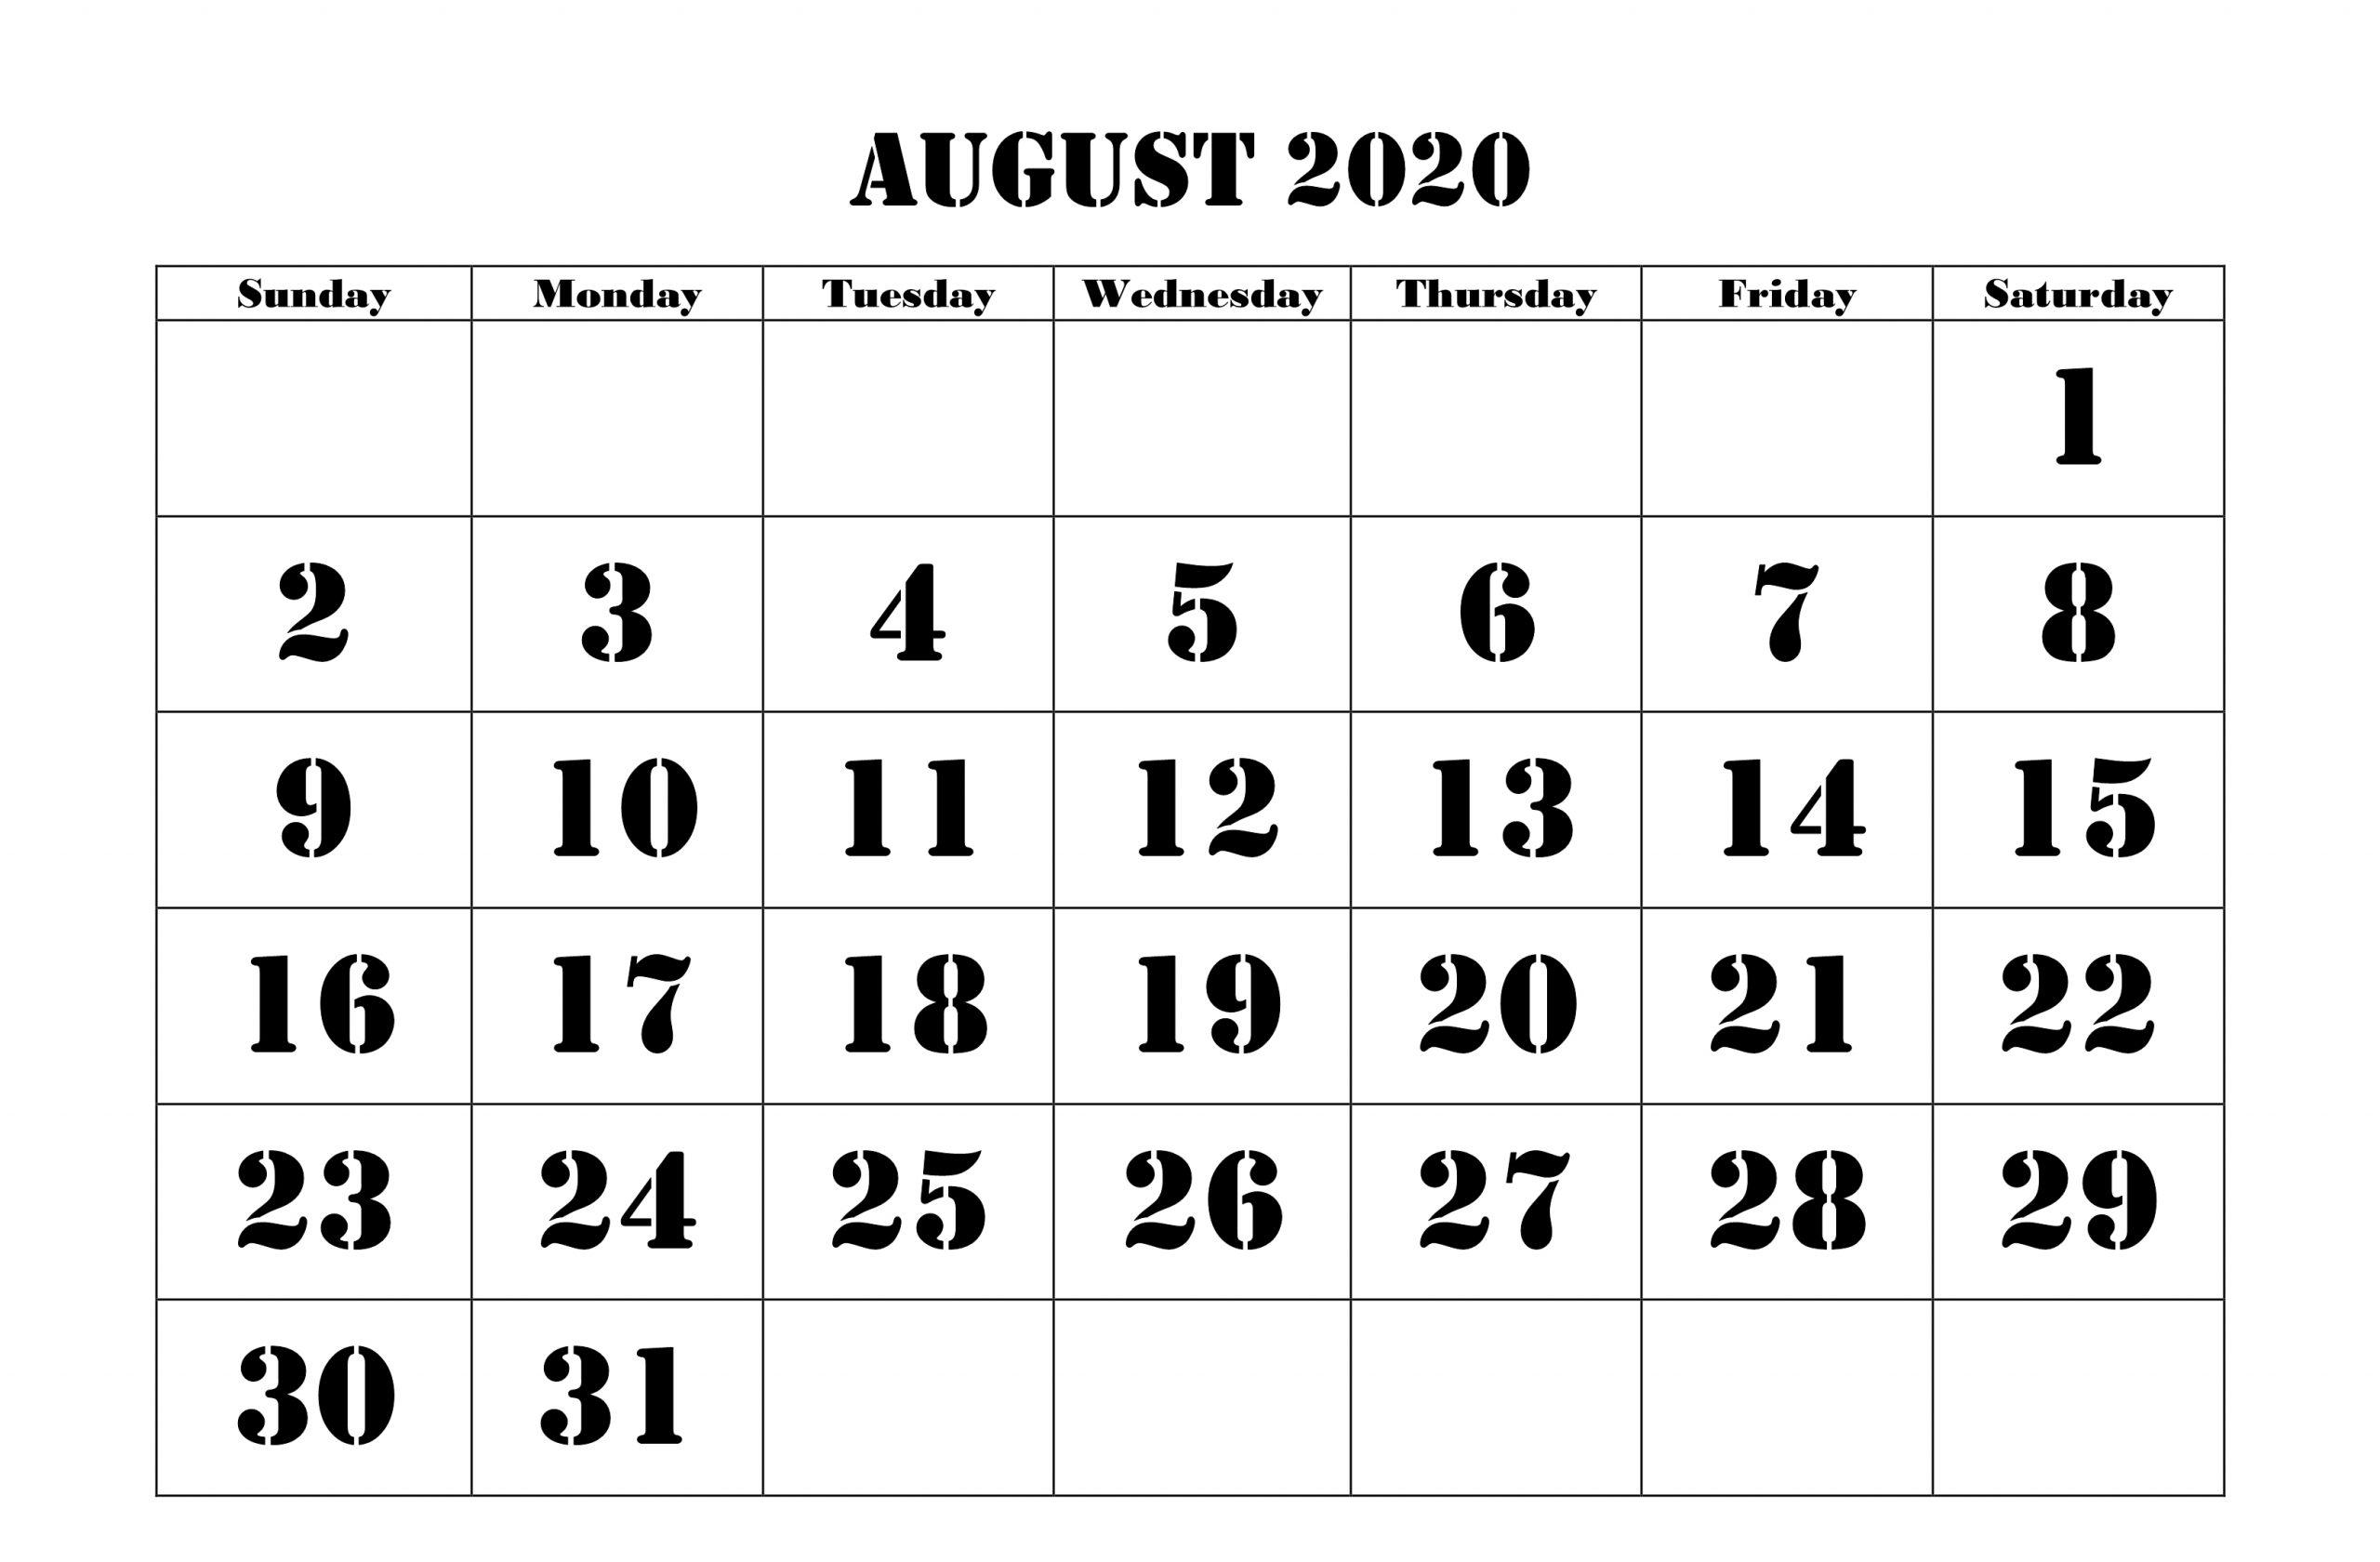 August Calendar 2020 Printable